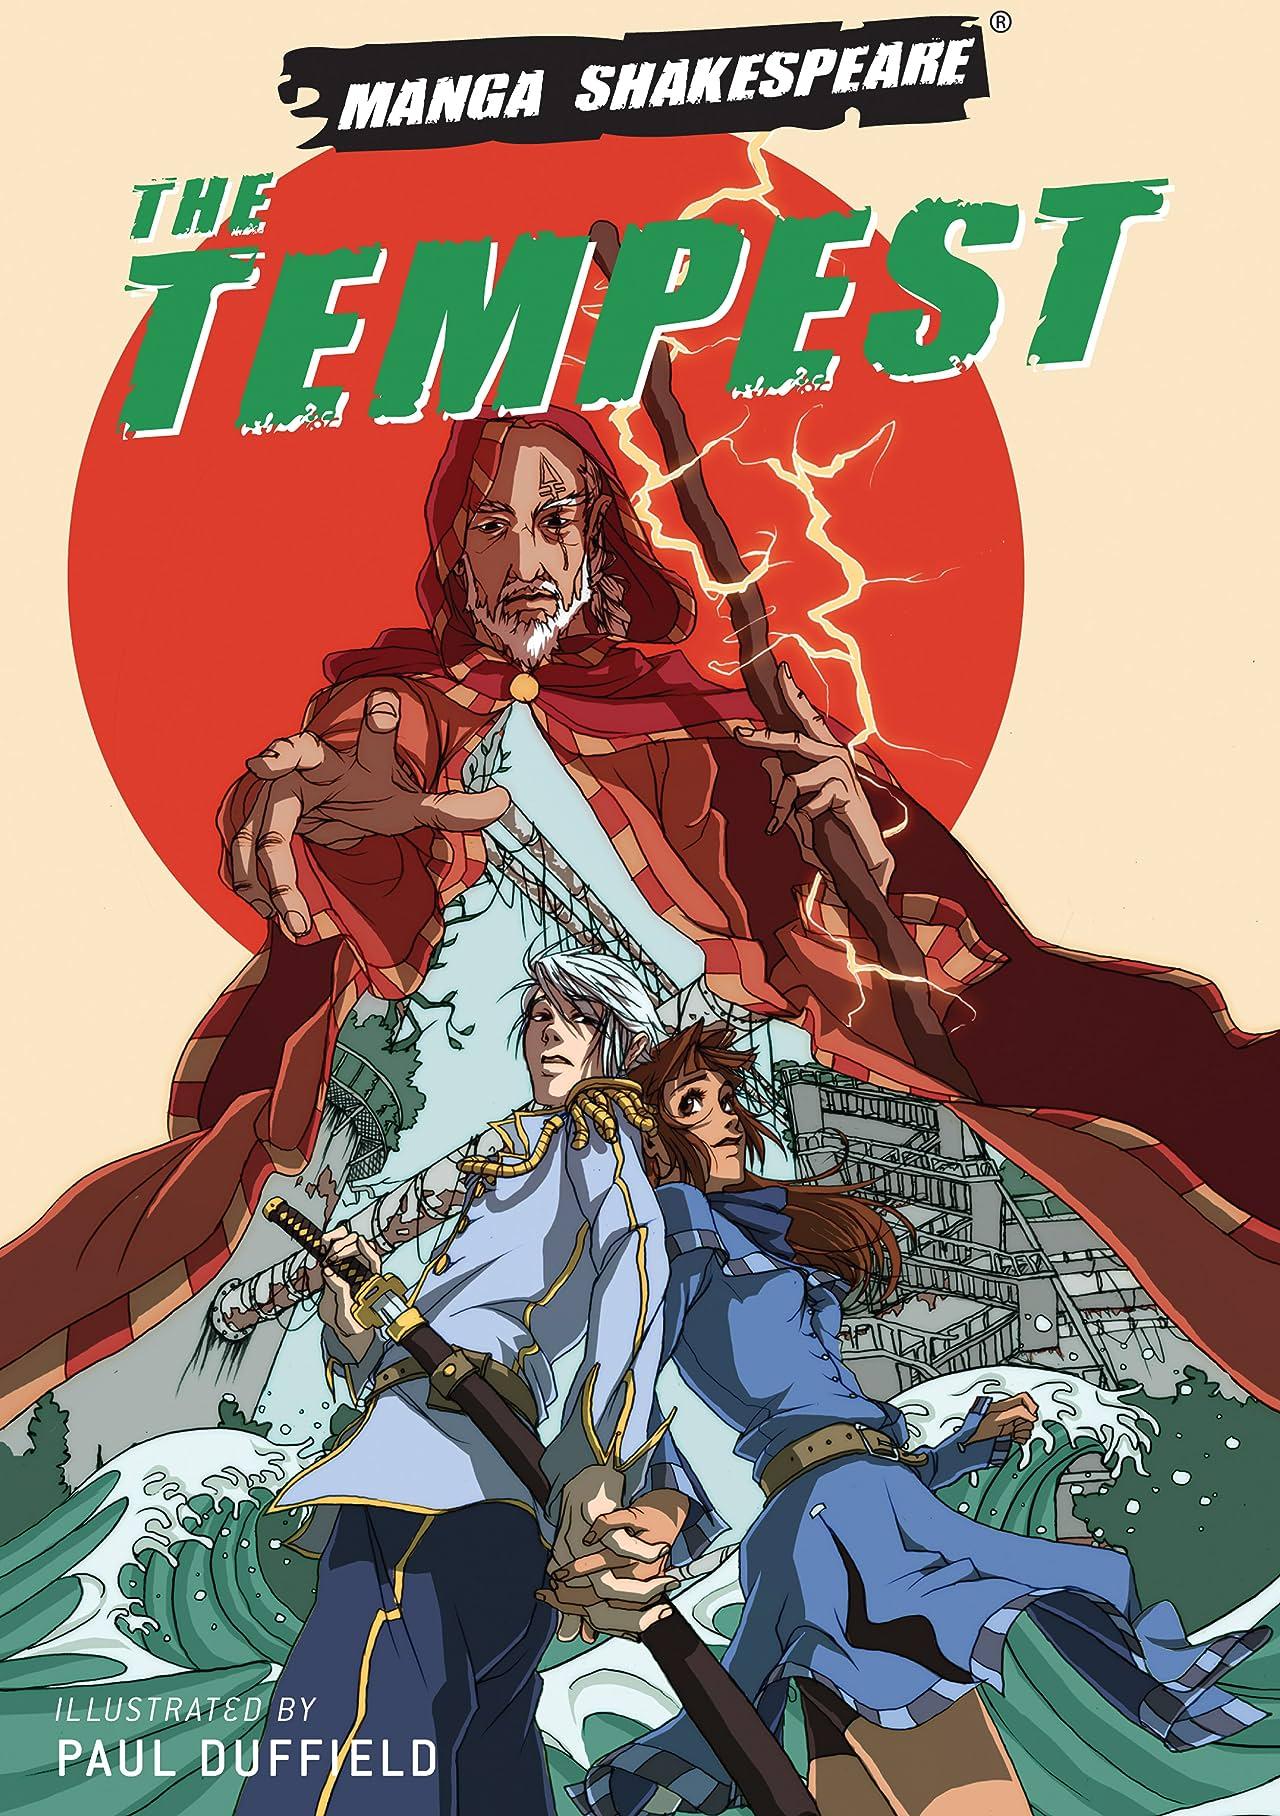 Manga Shakespeare: The Tempest